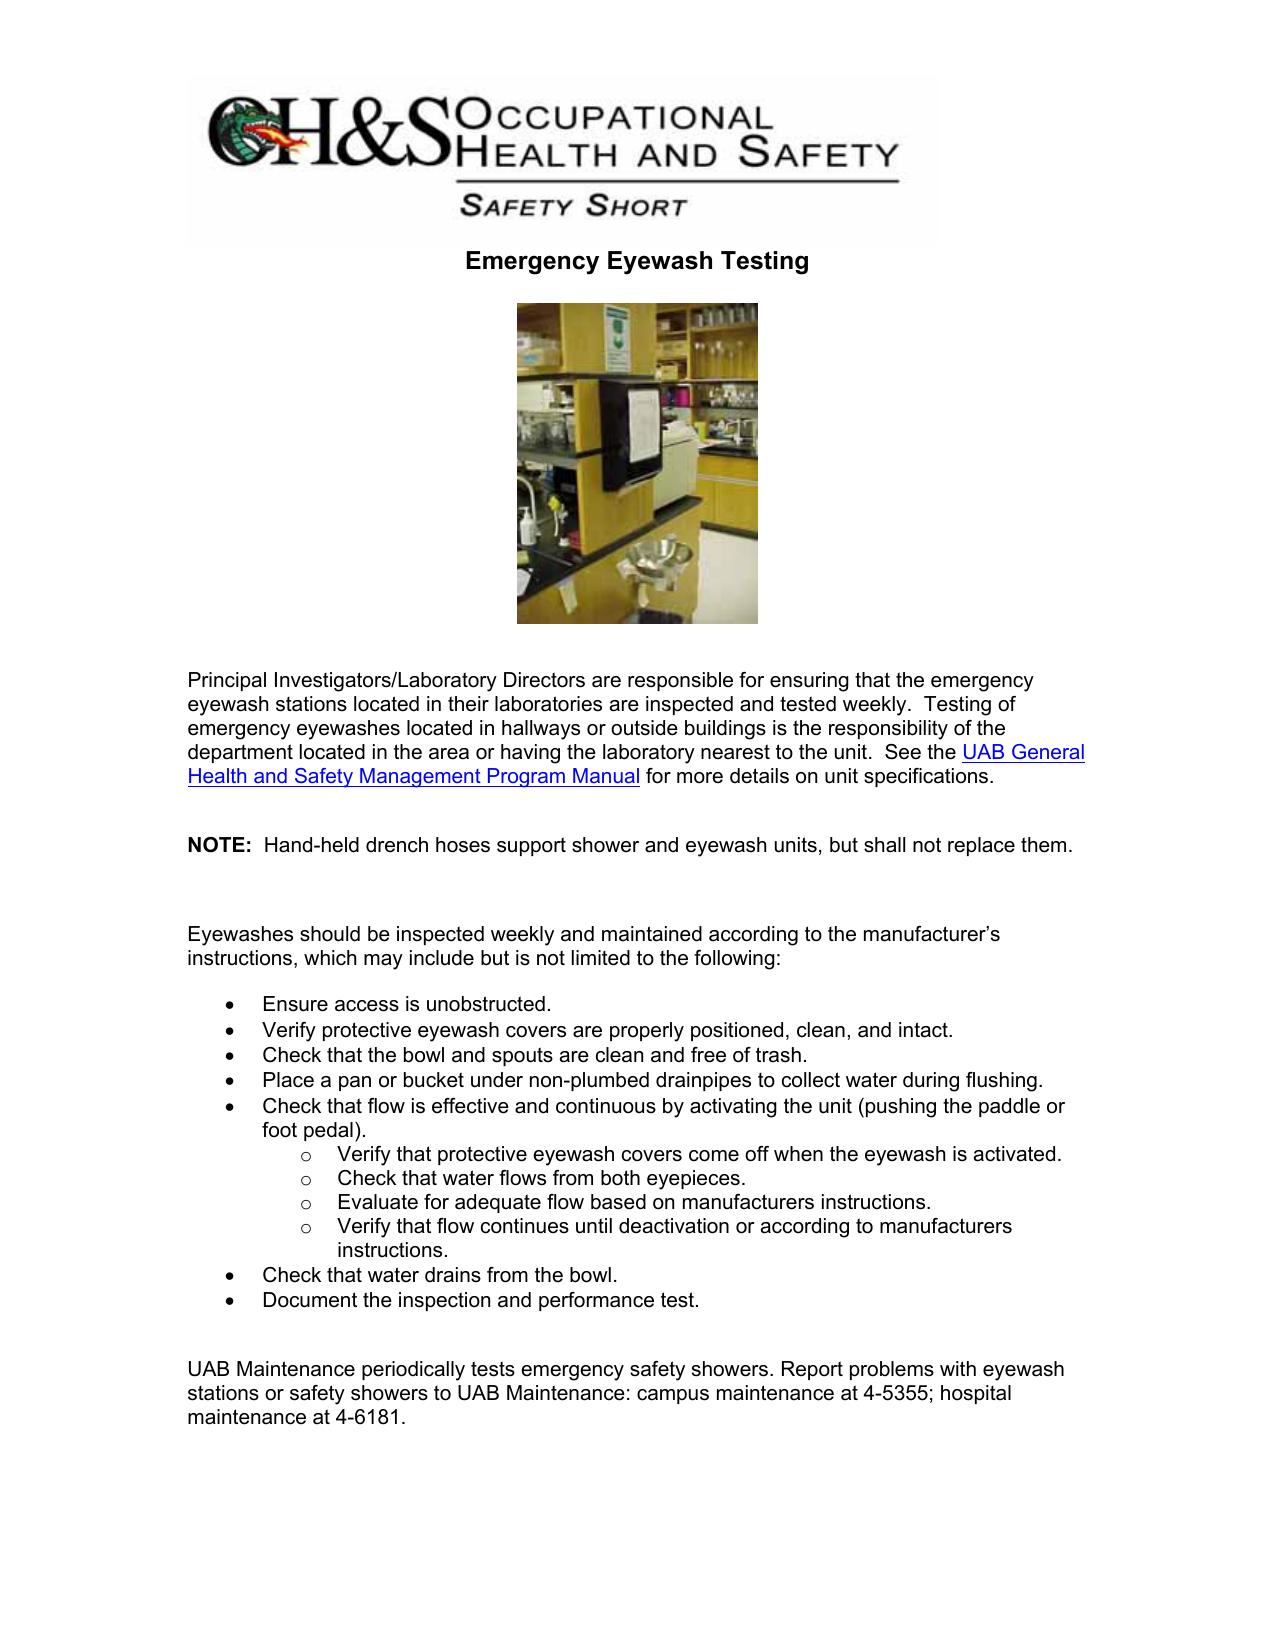 Emergency Eyewash Testing | manualzz com